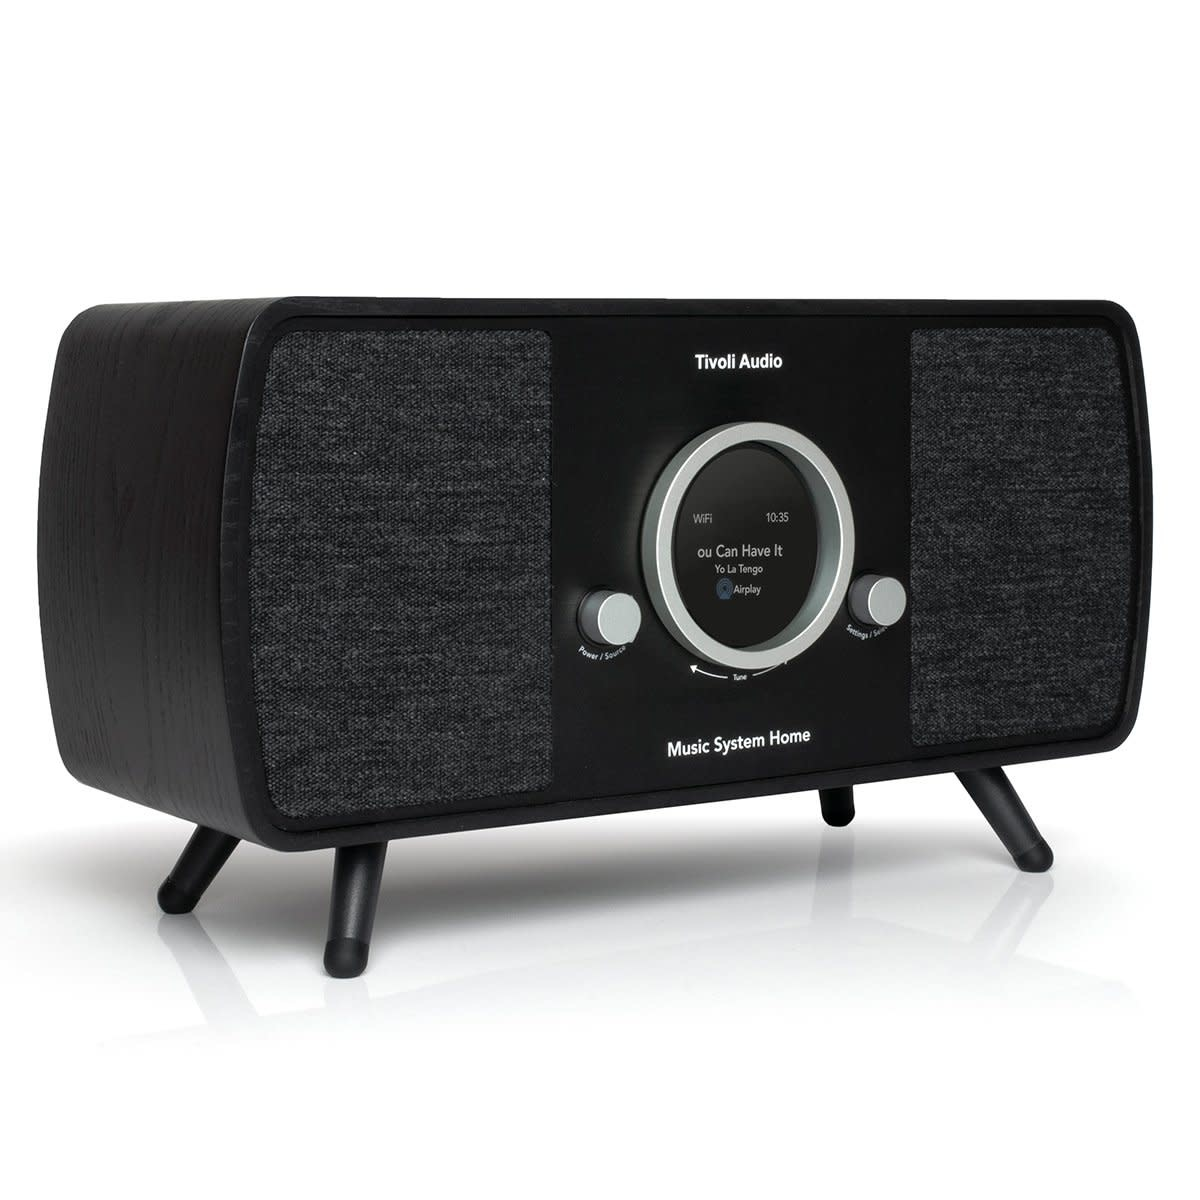 Music System Home (Gen. 2) Black-3